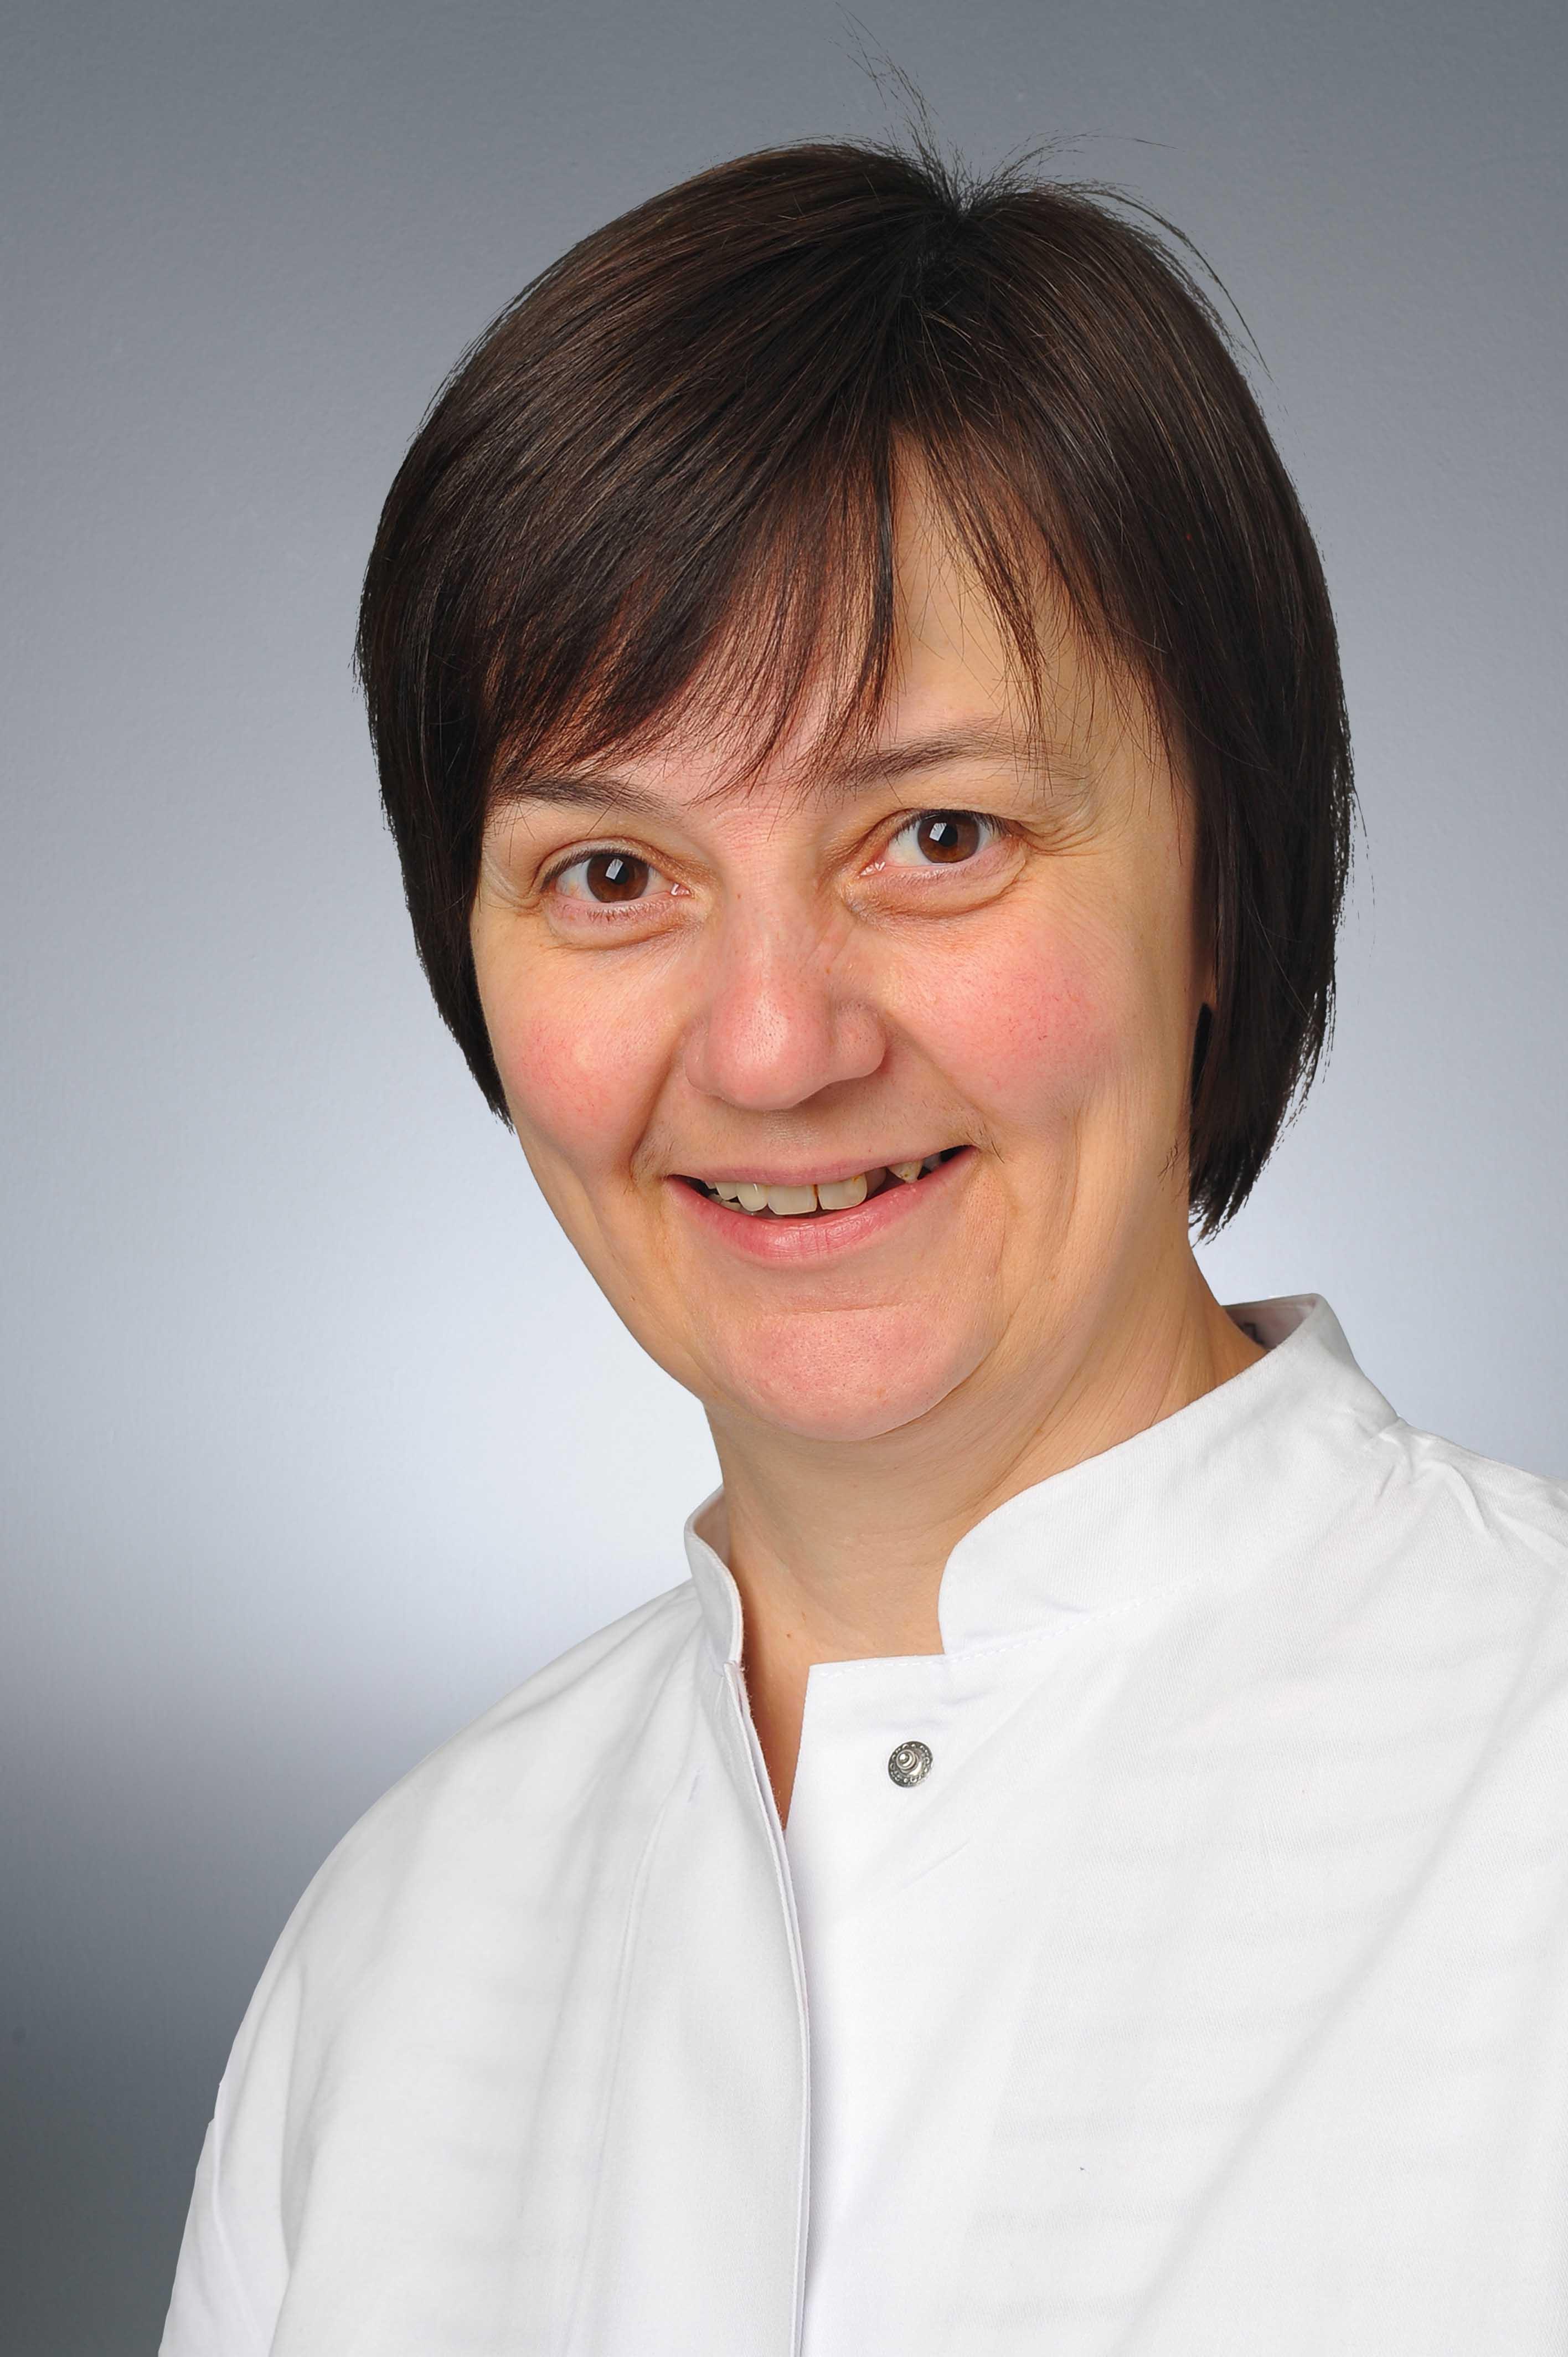 PD Dr. med. Angela Kribs